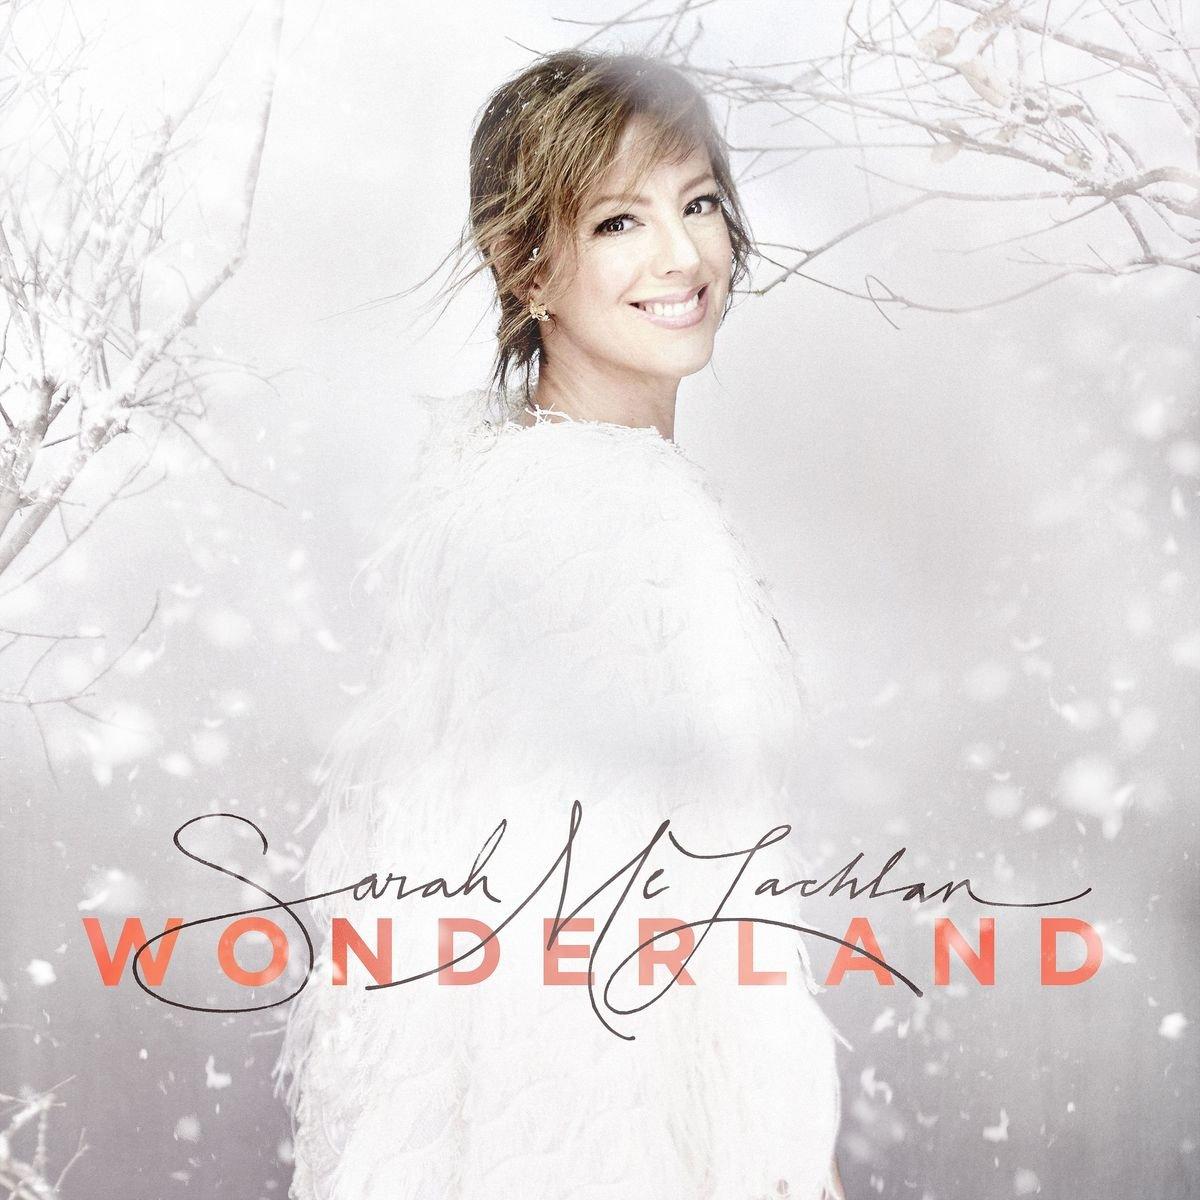 Wonderland kopen